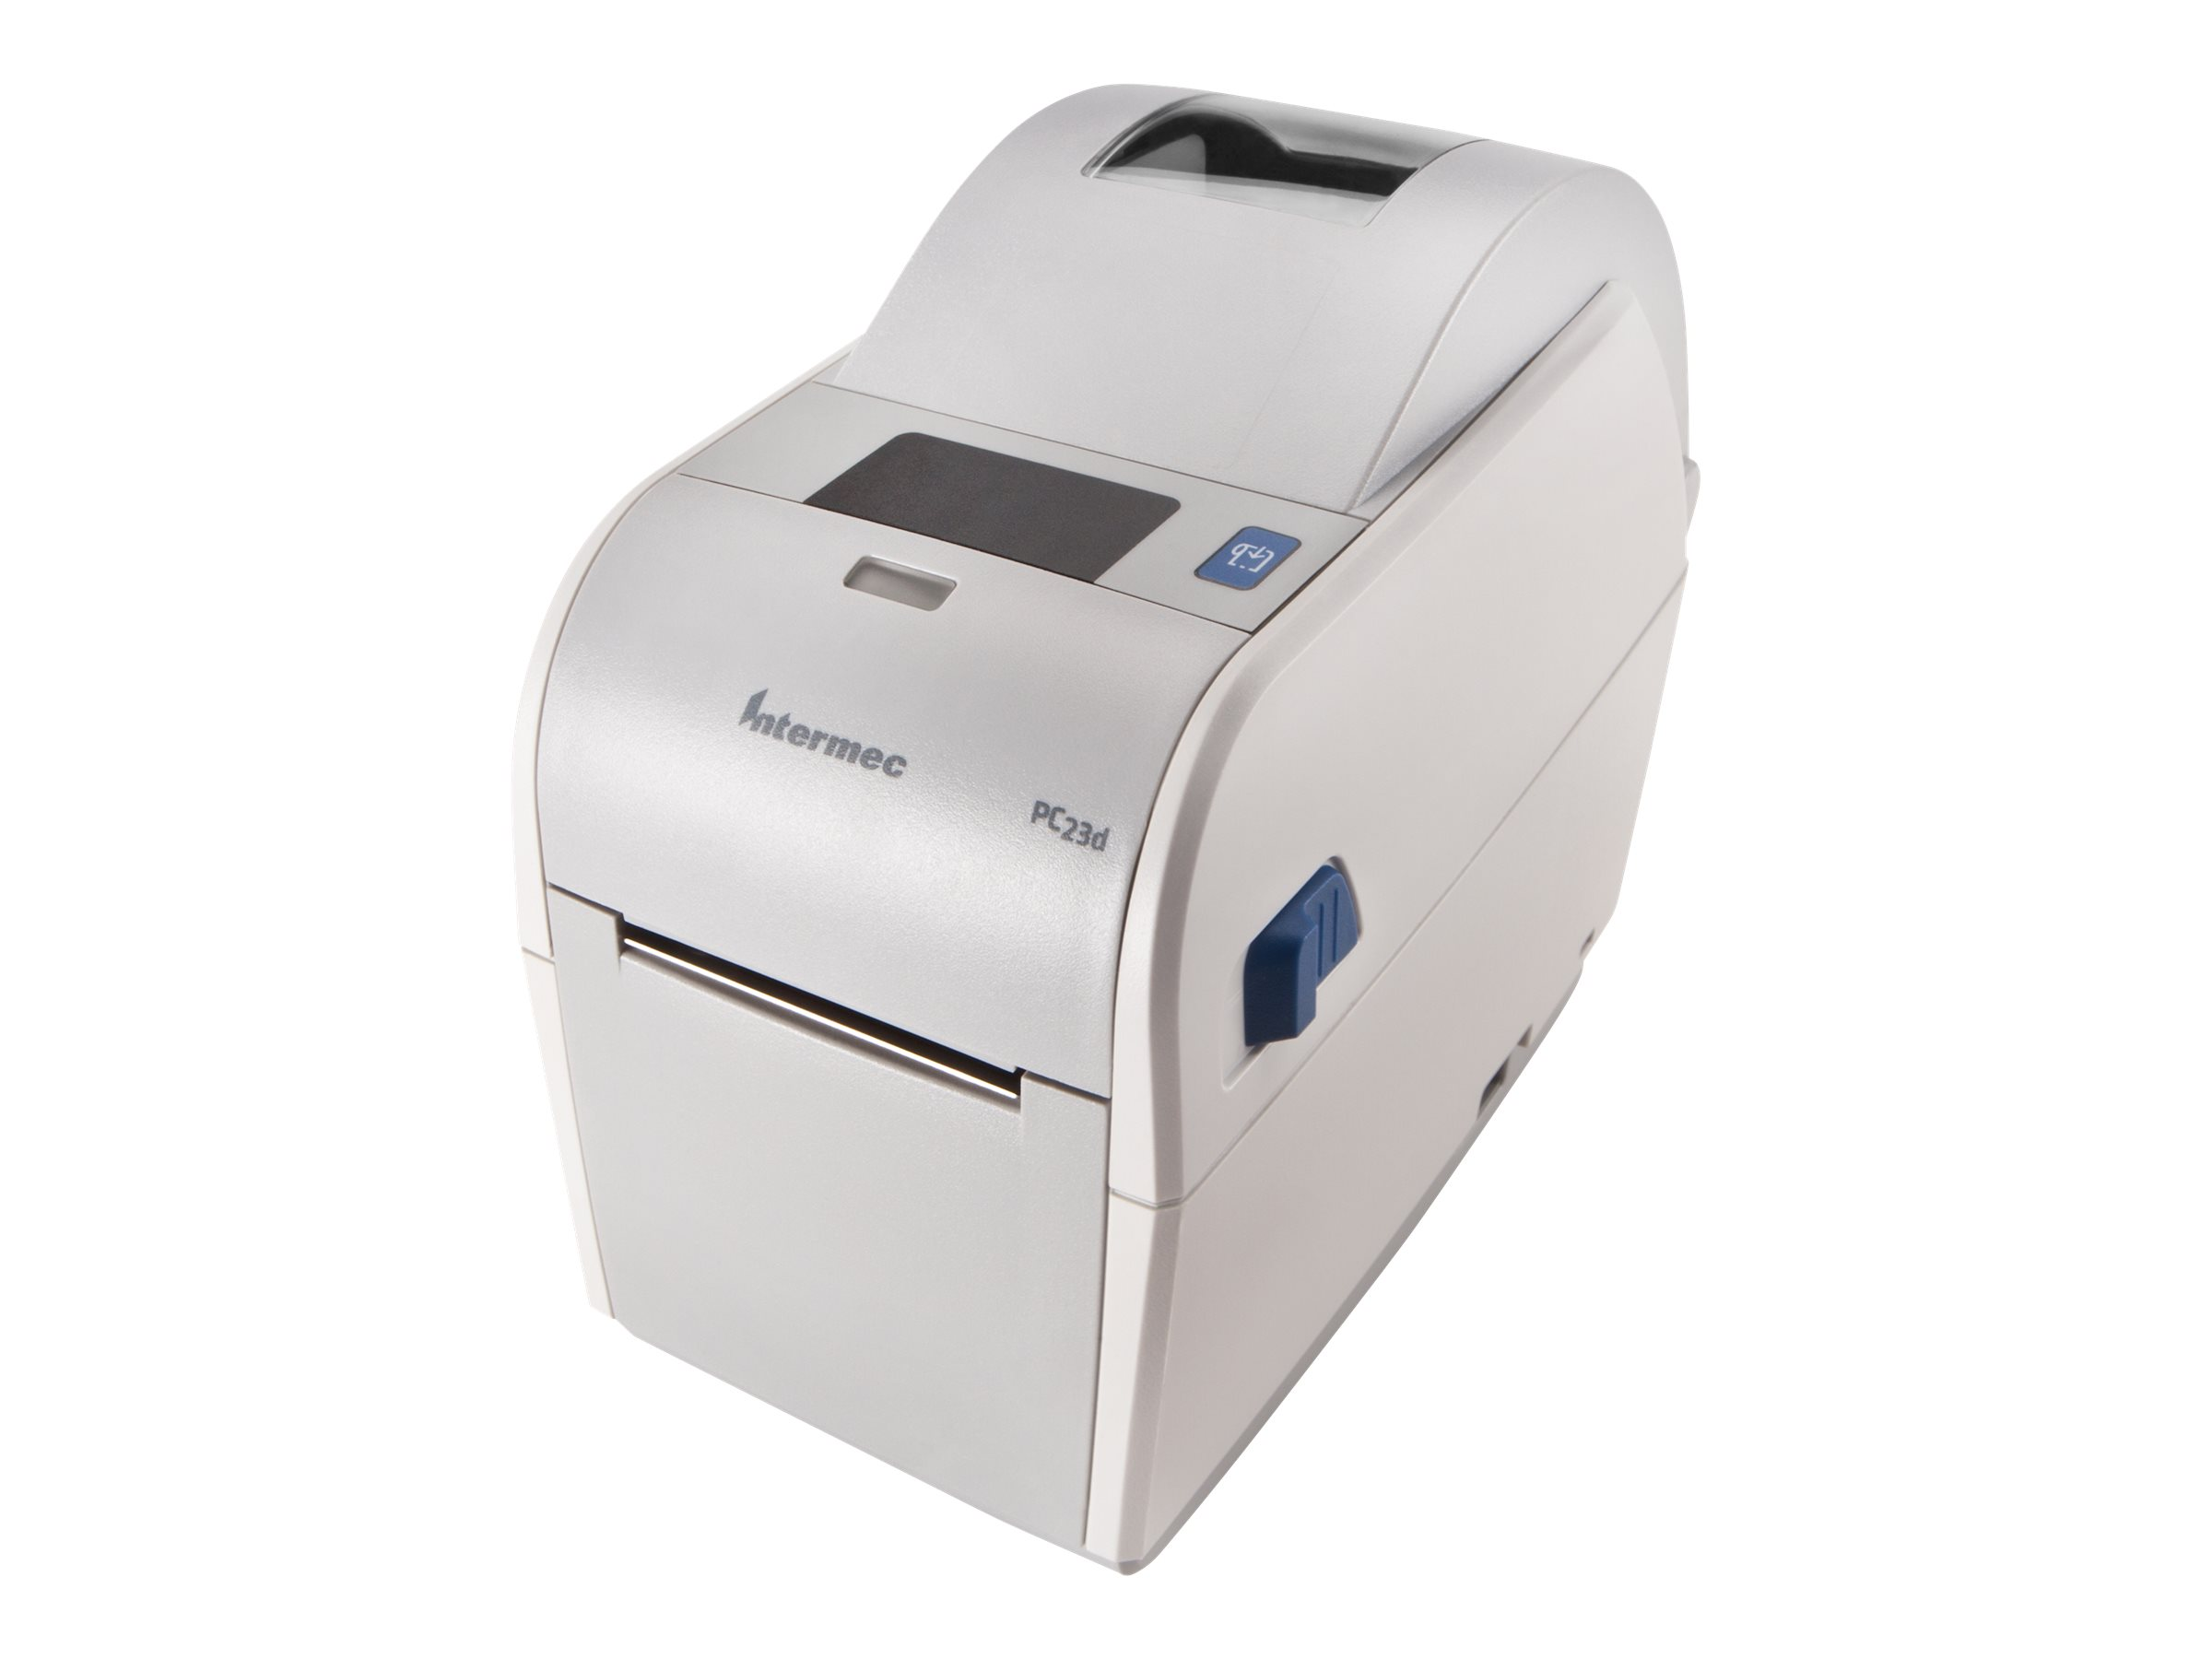 HONEYWELL PC23d - Etikettendrucker - Thermopapier